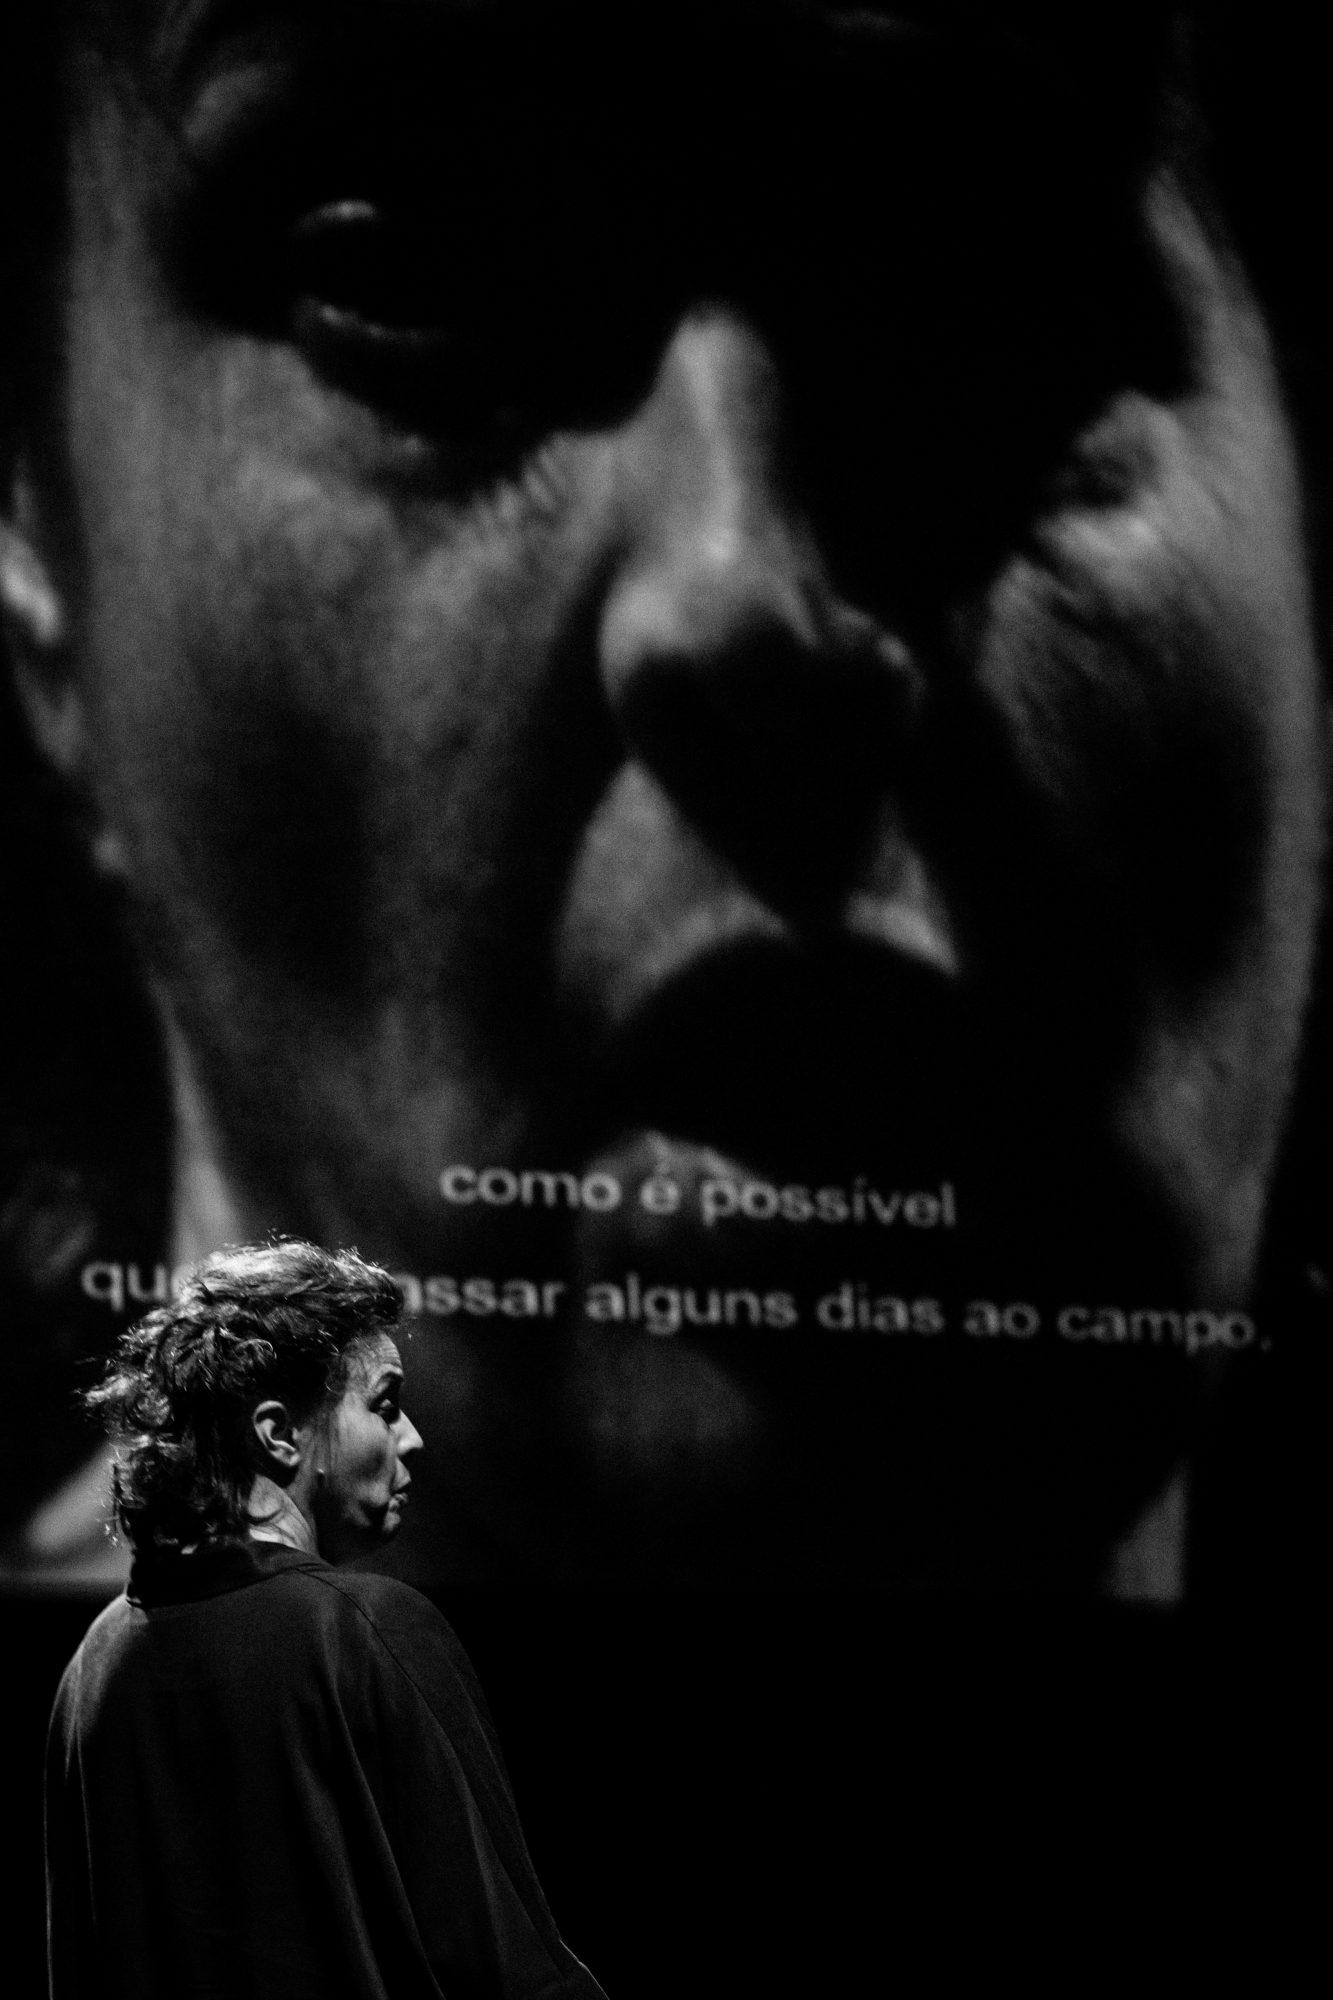 Rehearsal picture © Estelle Valente